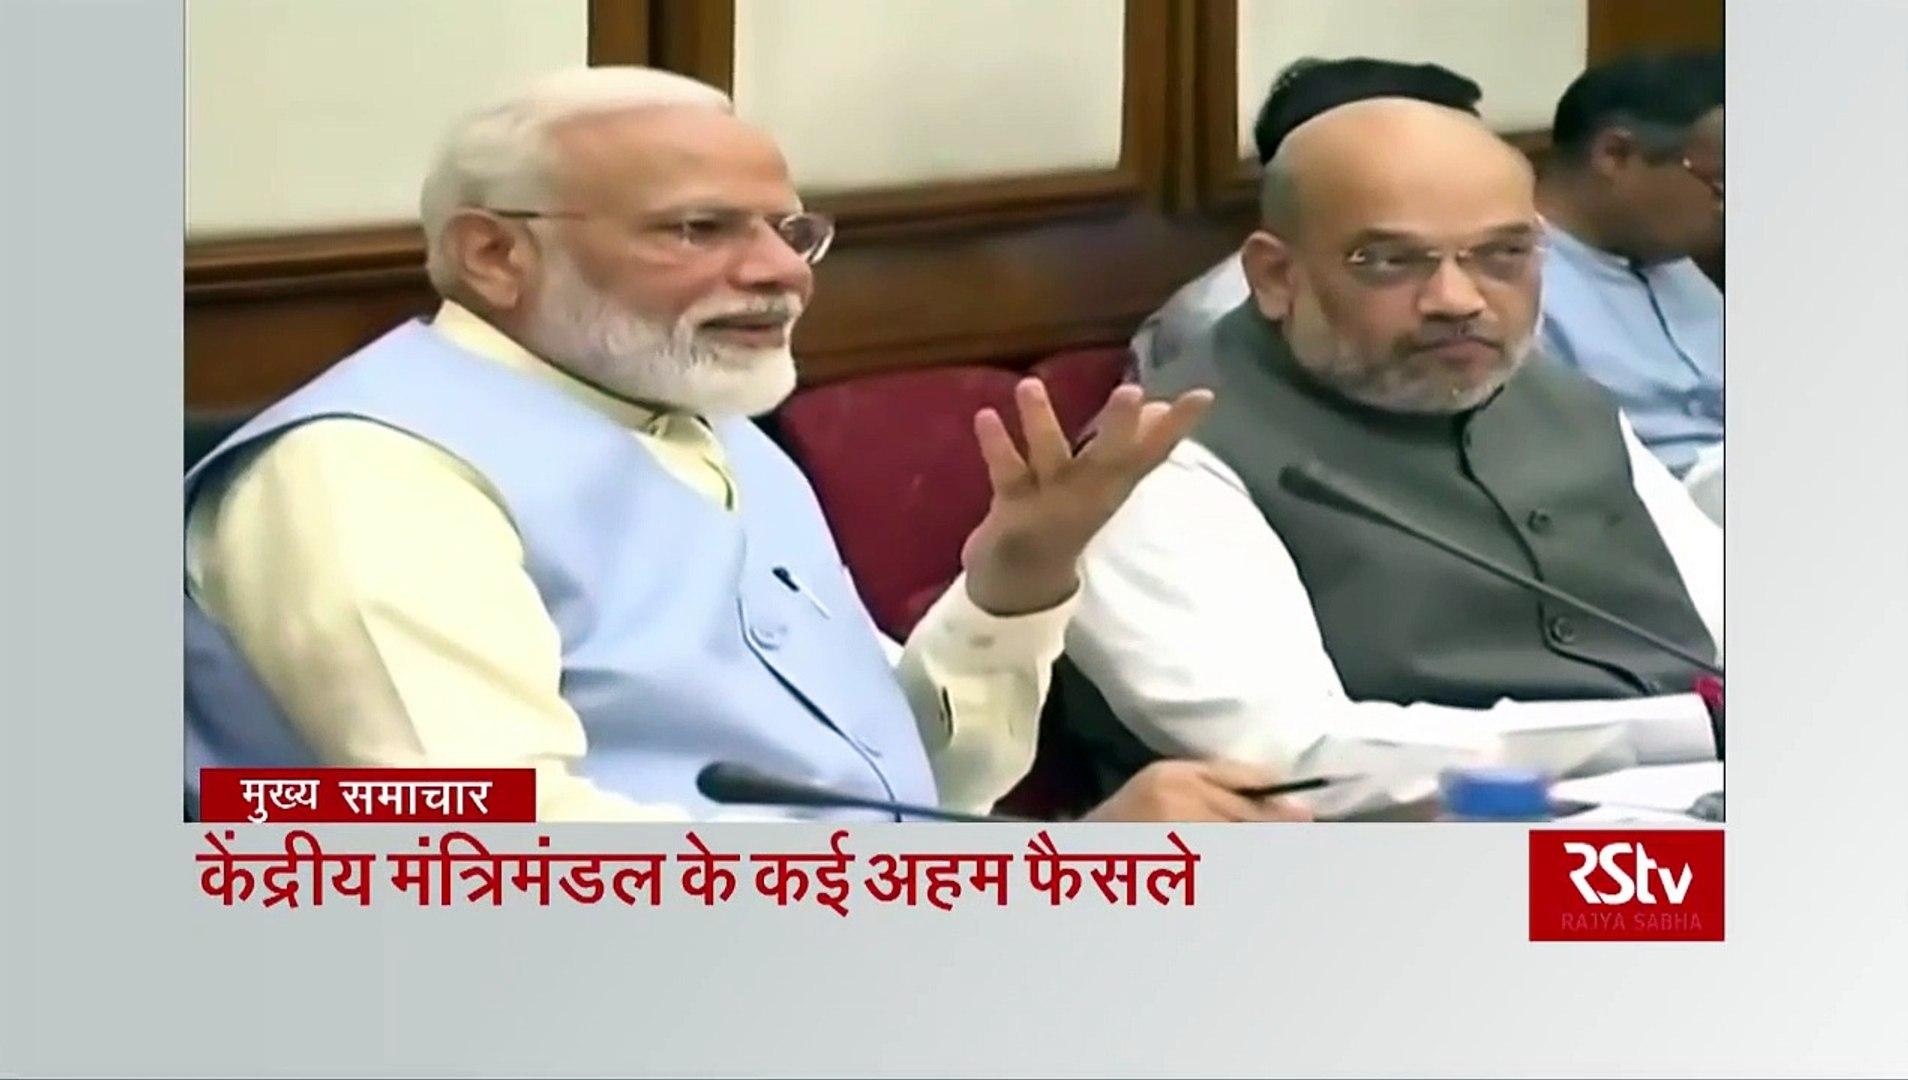 27 February 2020 : Morning News | Latest News Today |  Today News | Hindi News | India News